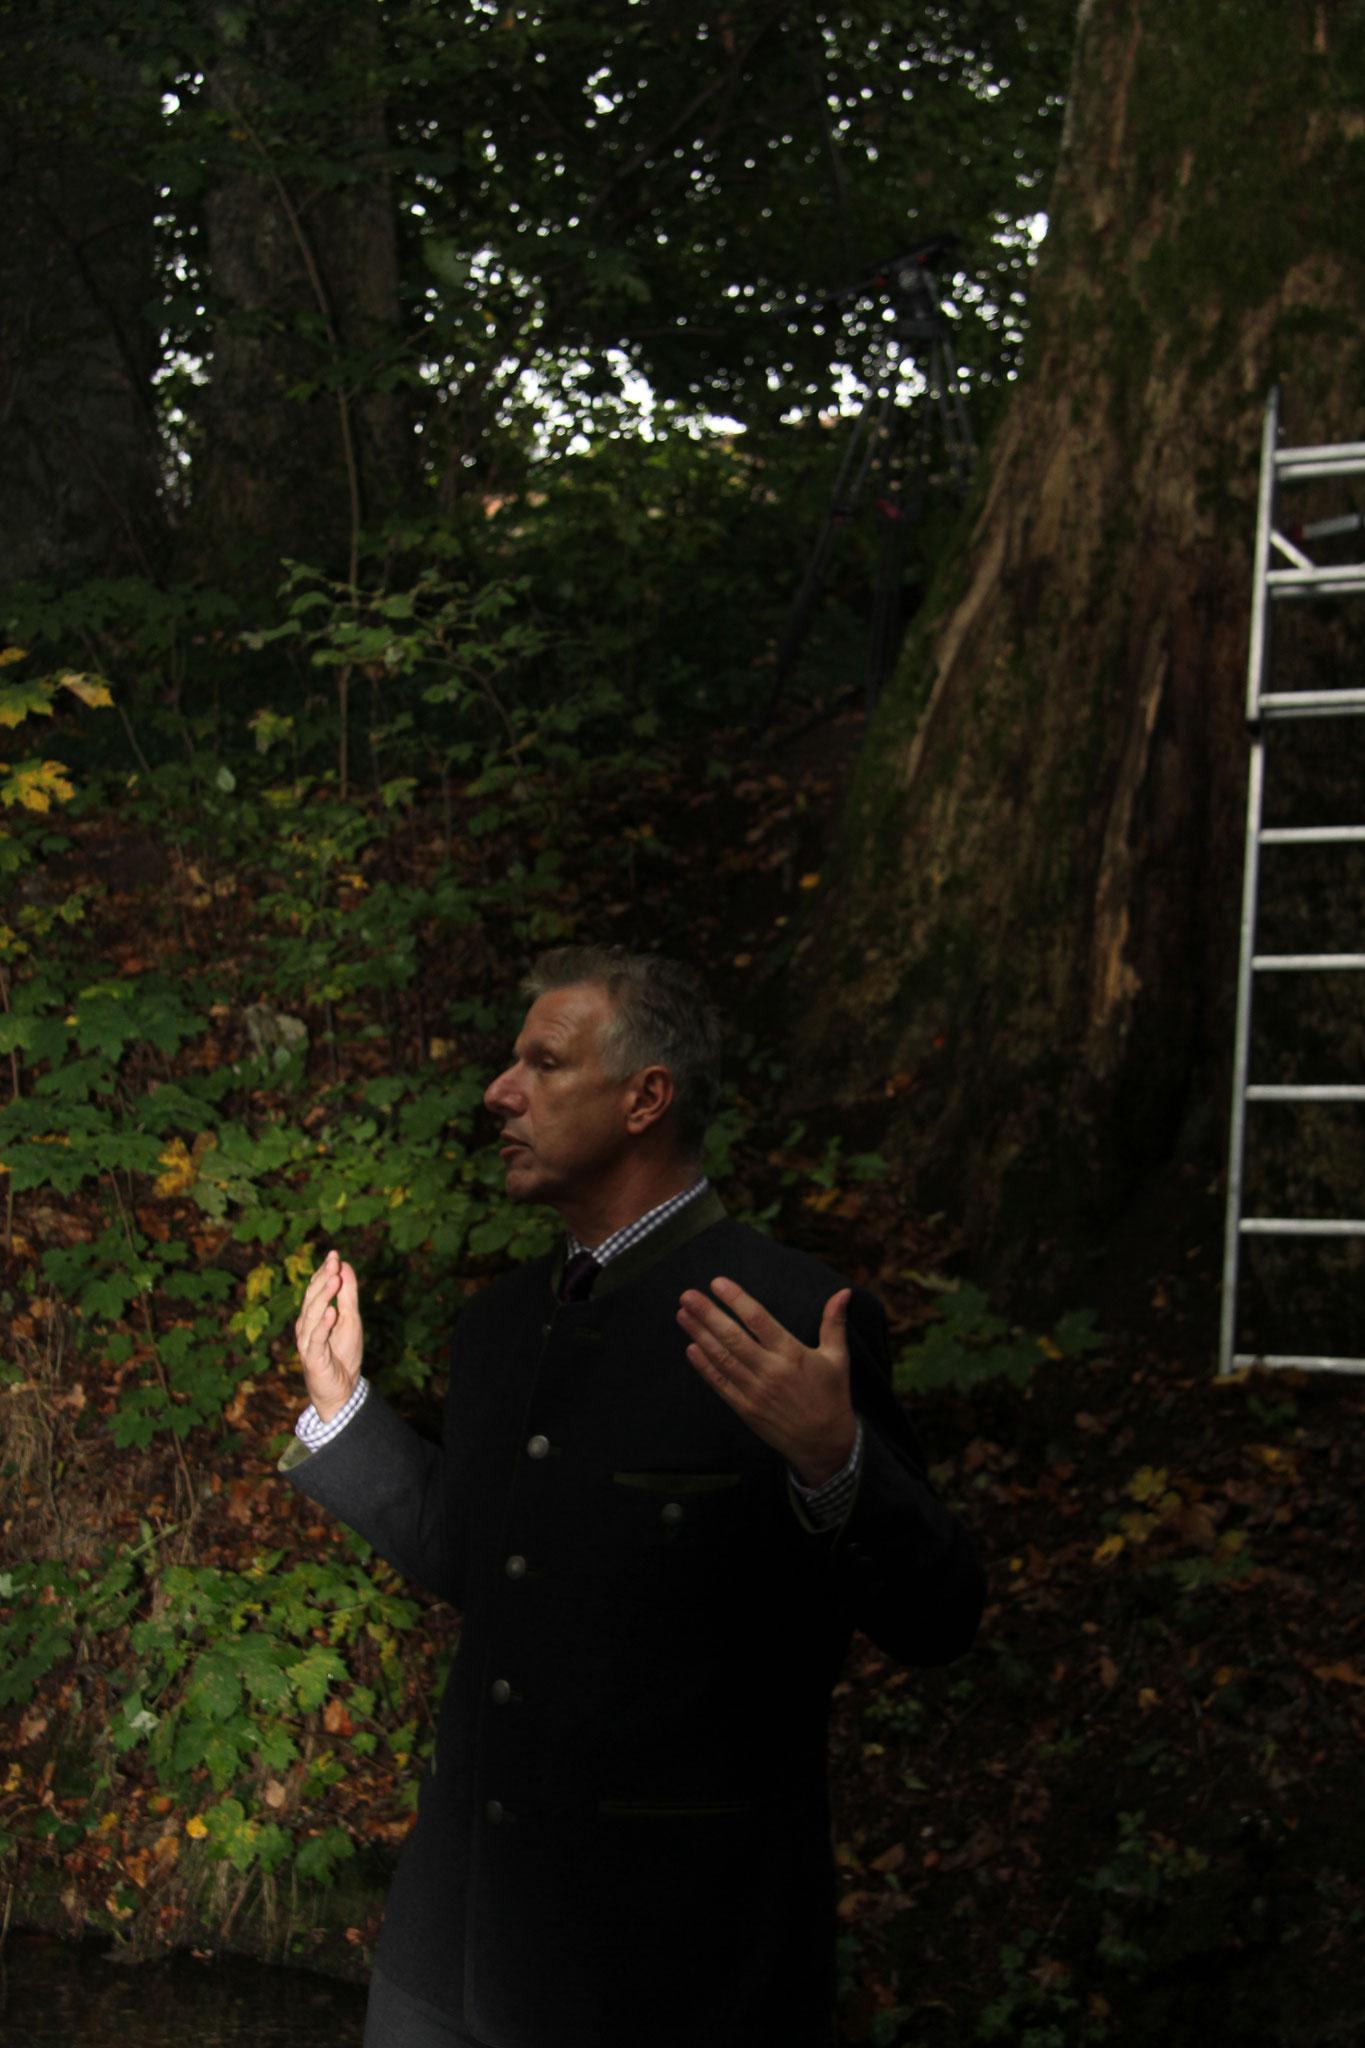 Landrat Dr. Schmid begrüßt zu Beginn der Preisverleihung unmittelbar im Wald